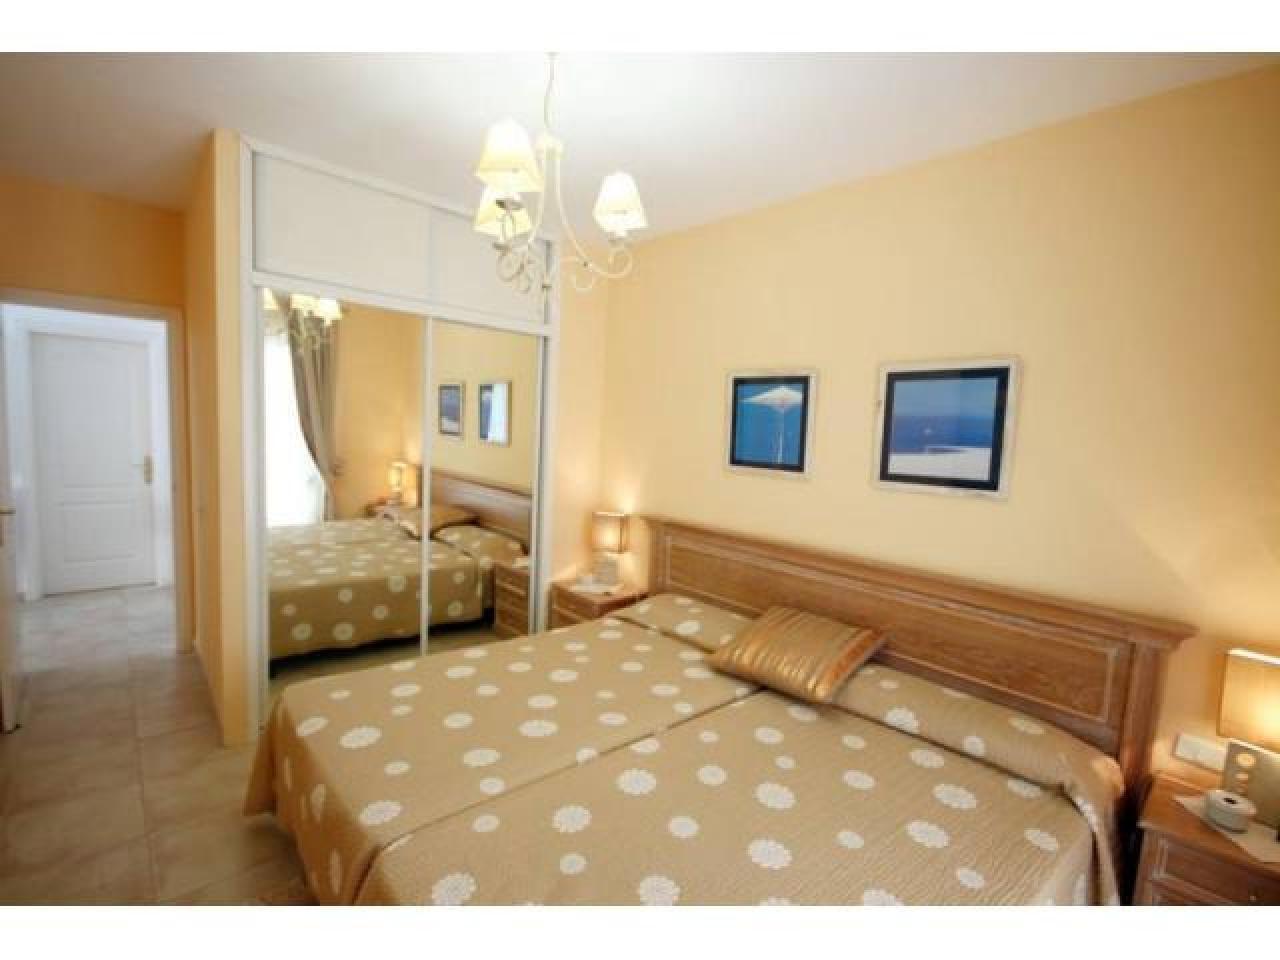 Villa in Tenerife for rent, in Costa Adeje, Madronal de Fanabe - 5